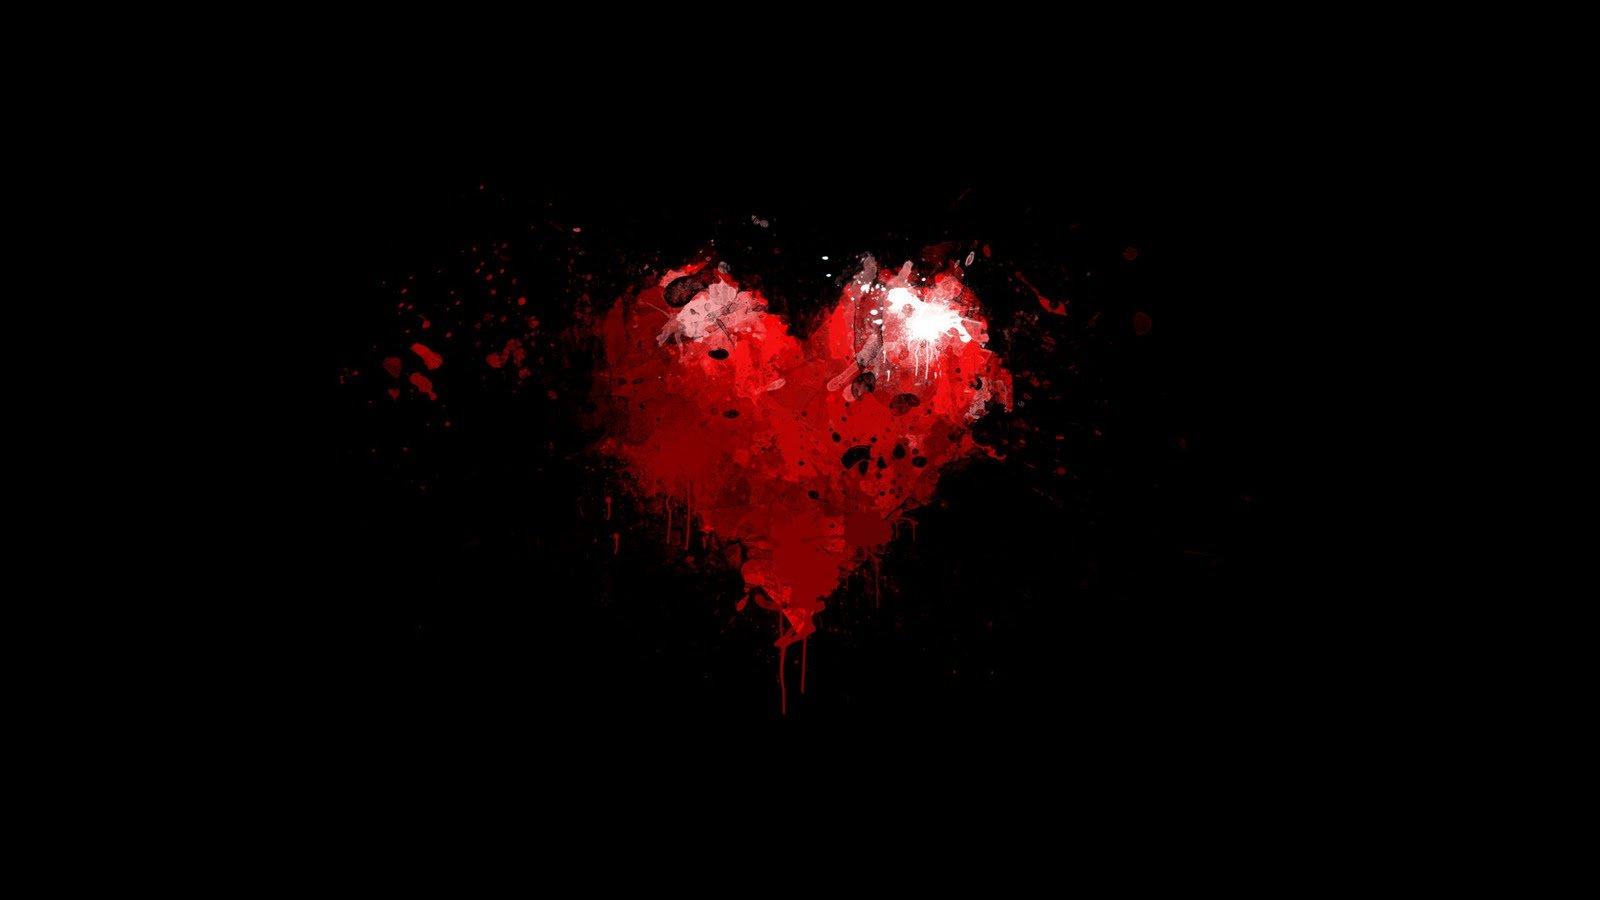 HD Heart Wallpaper - WallpaperSafari